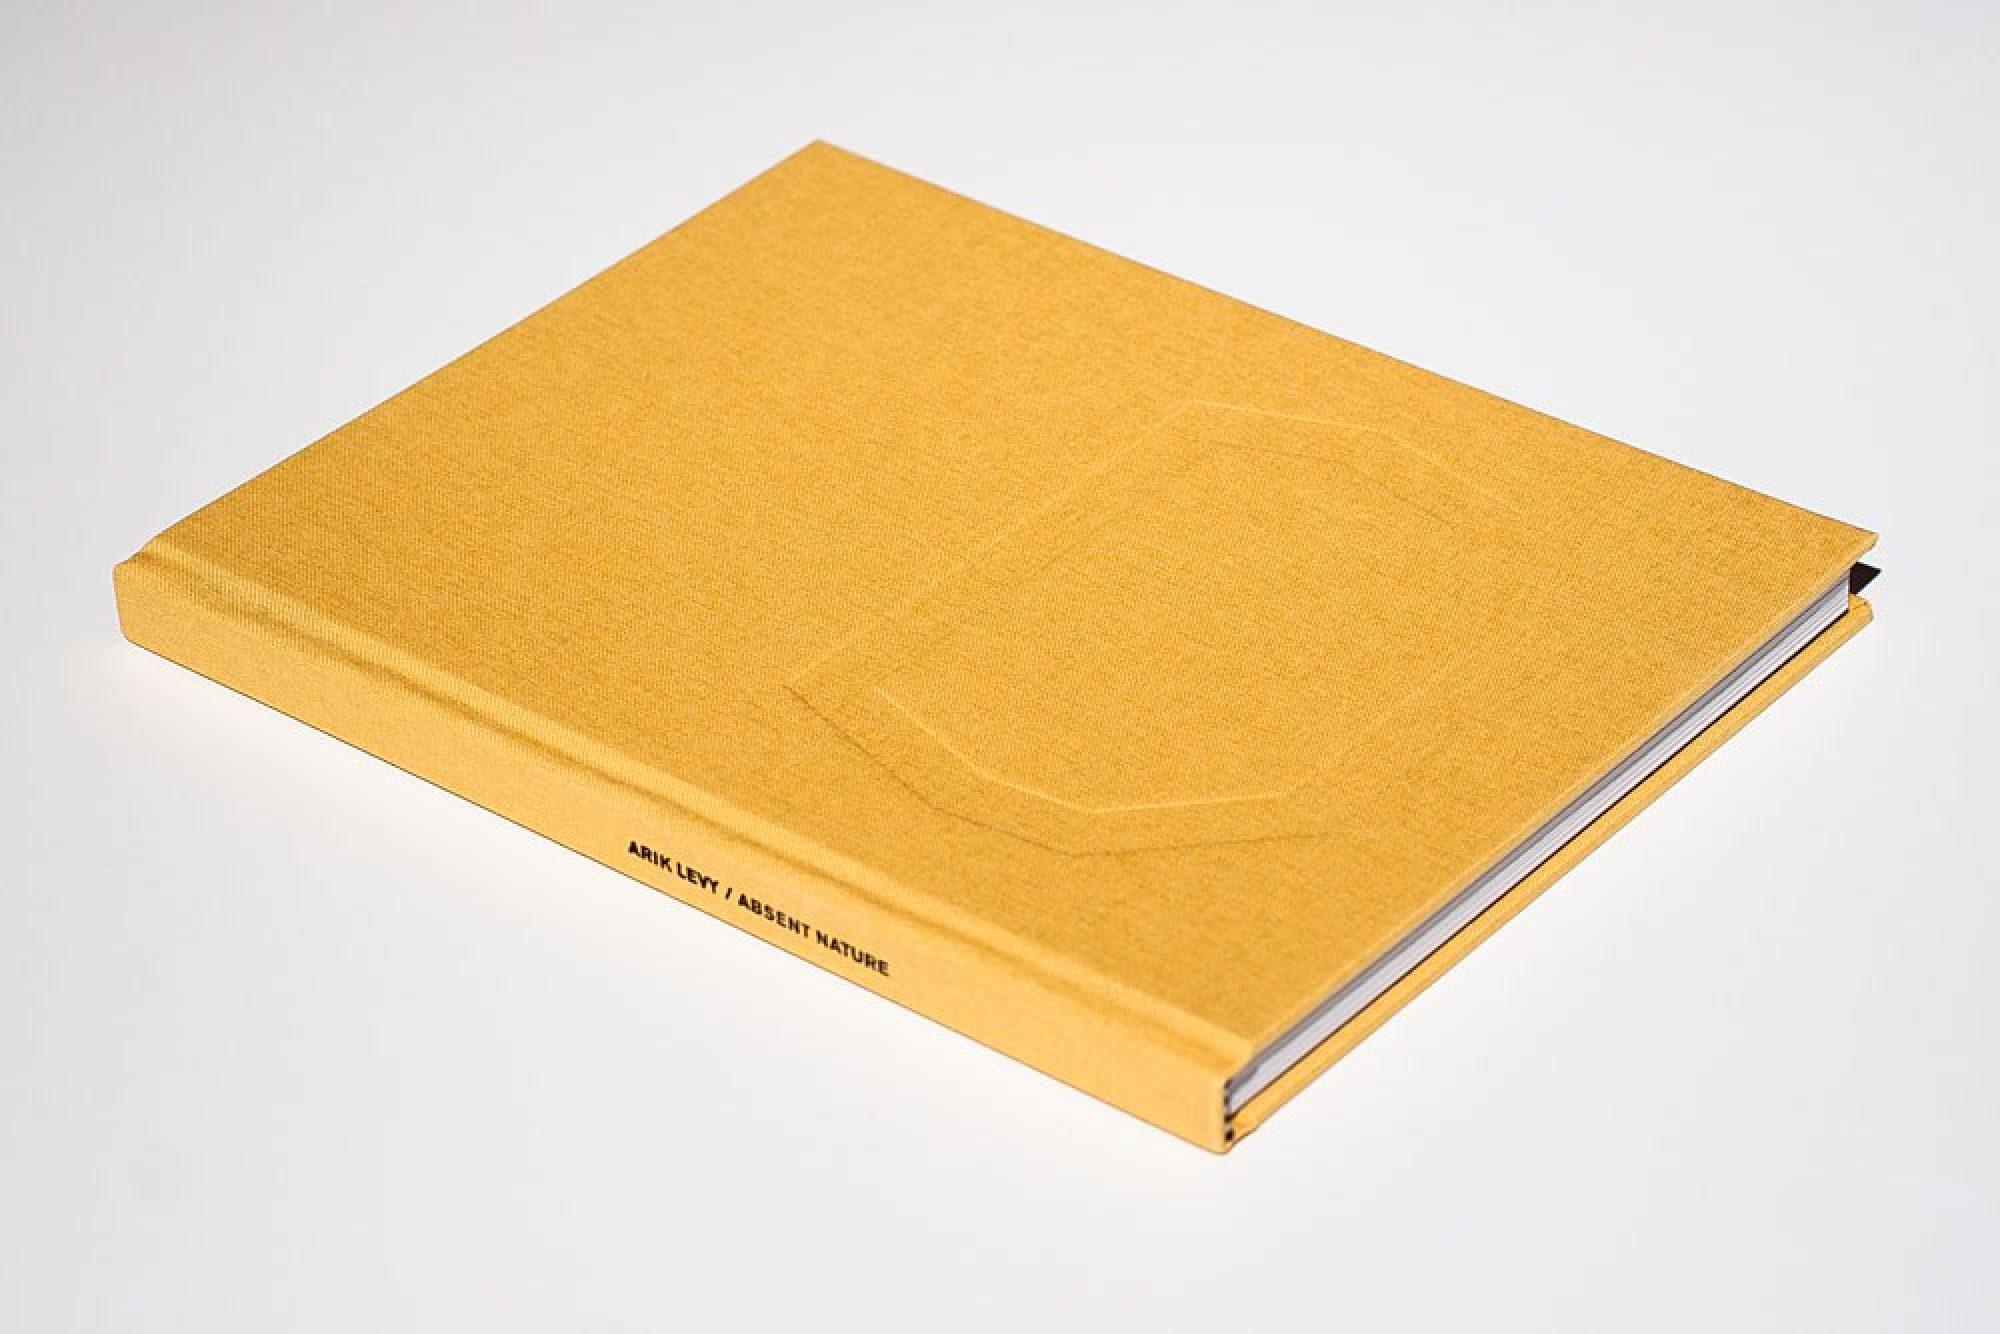 Arik Levy Absent Nature Catalog